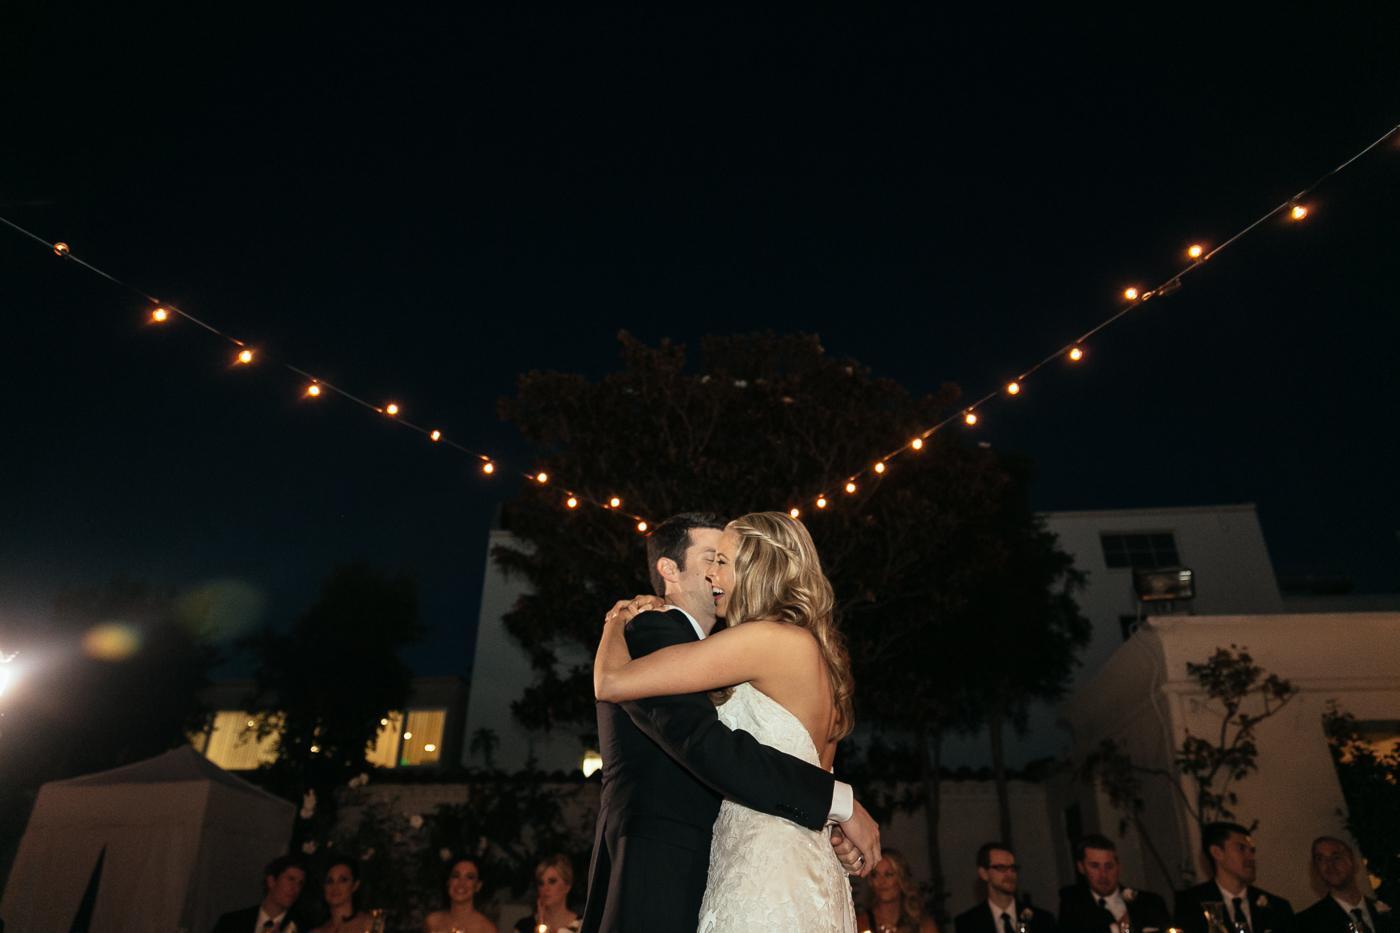 RYAN_&_KELLEY_DARLINGTON_HOUSE_WEDDING_2014_7X9A2625.JPG